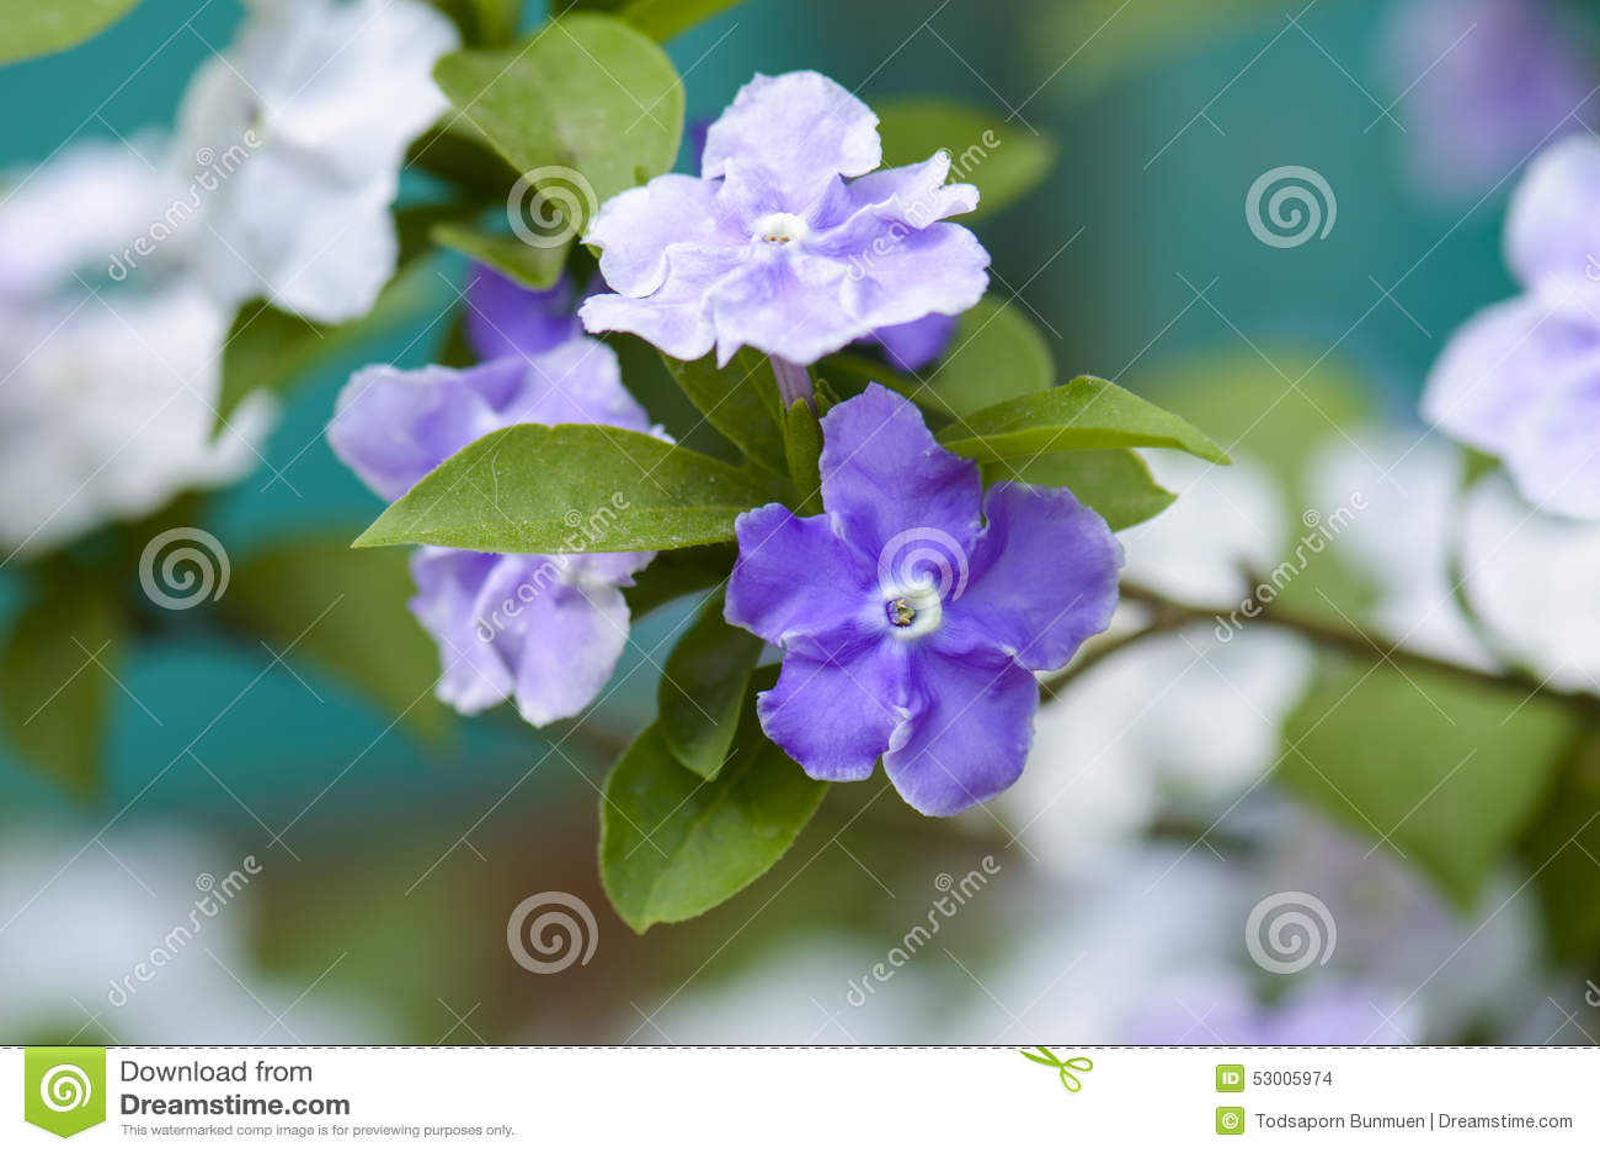 Closeup of violet brunfelsia jasmine flower stock photo image of closeup of violet brunfelsia jasmine flower izmirmasajfo